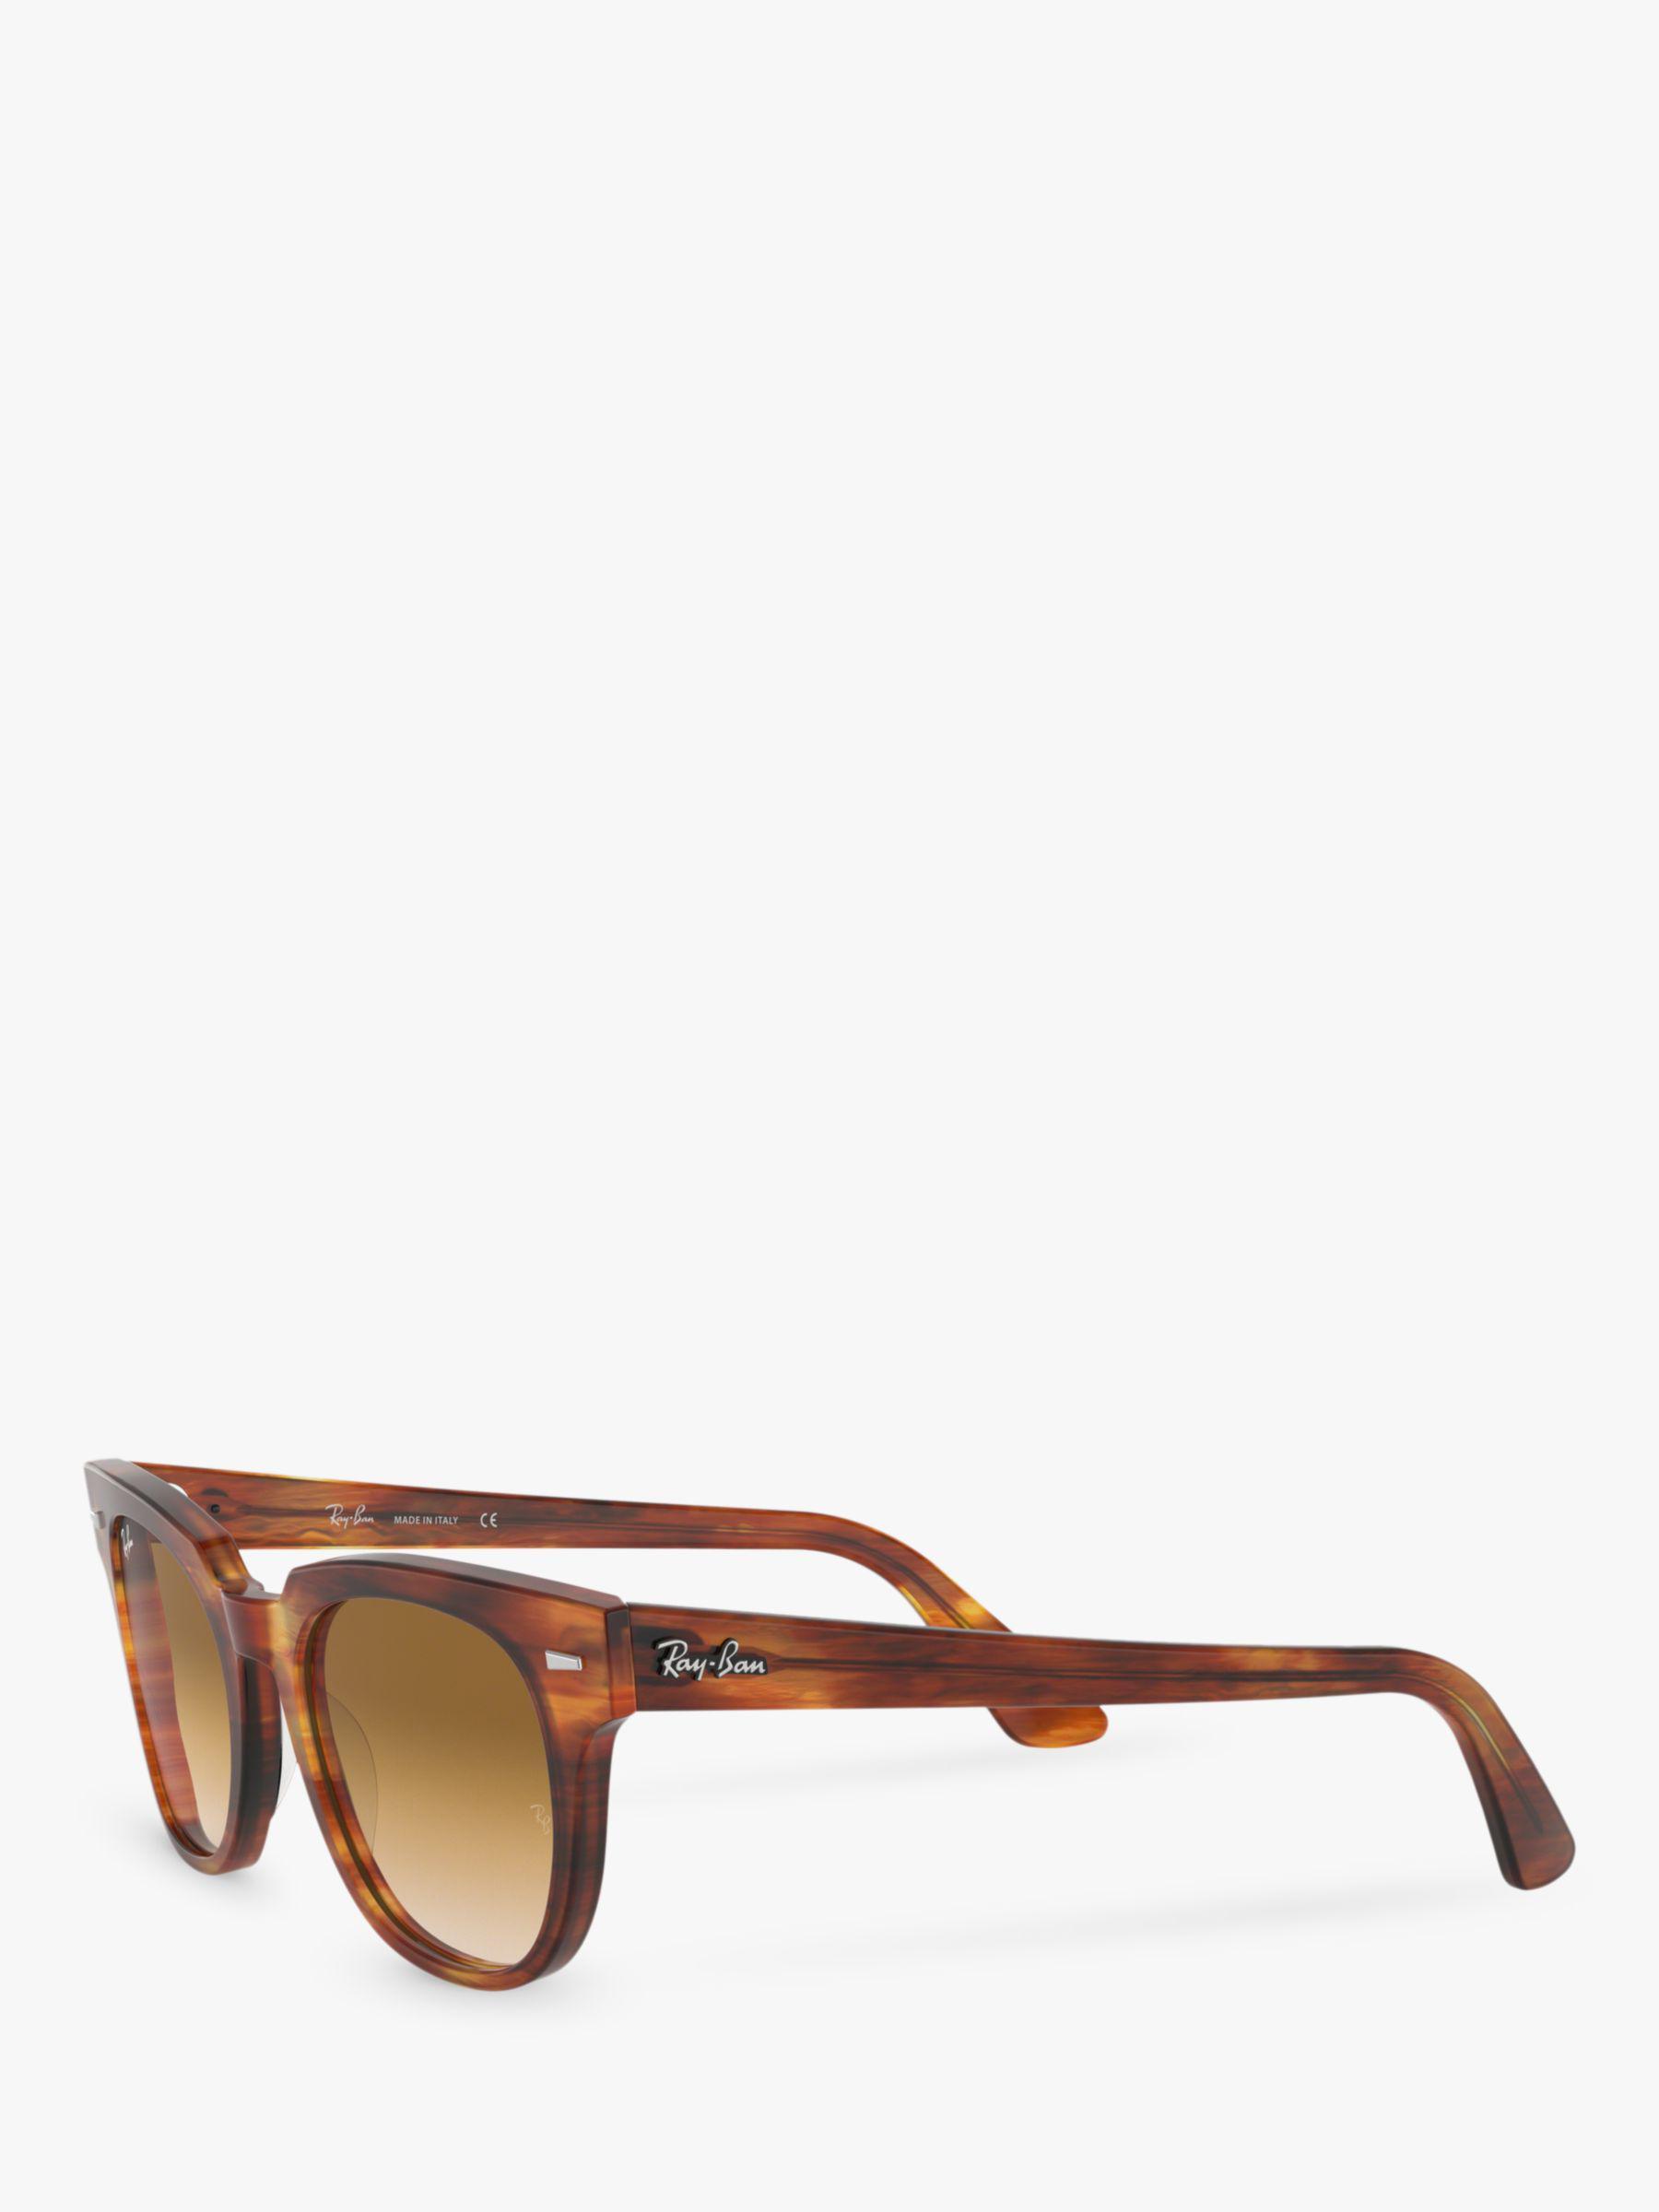 2ddafa832b6 Ray-Ban - Brown Rb2168 Unisex Square Sunglasses for Men - Lyst. View  fullscreen